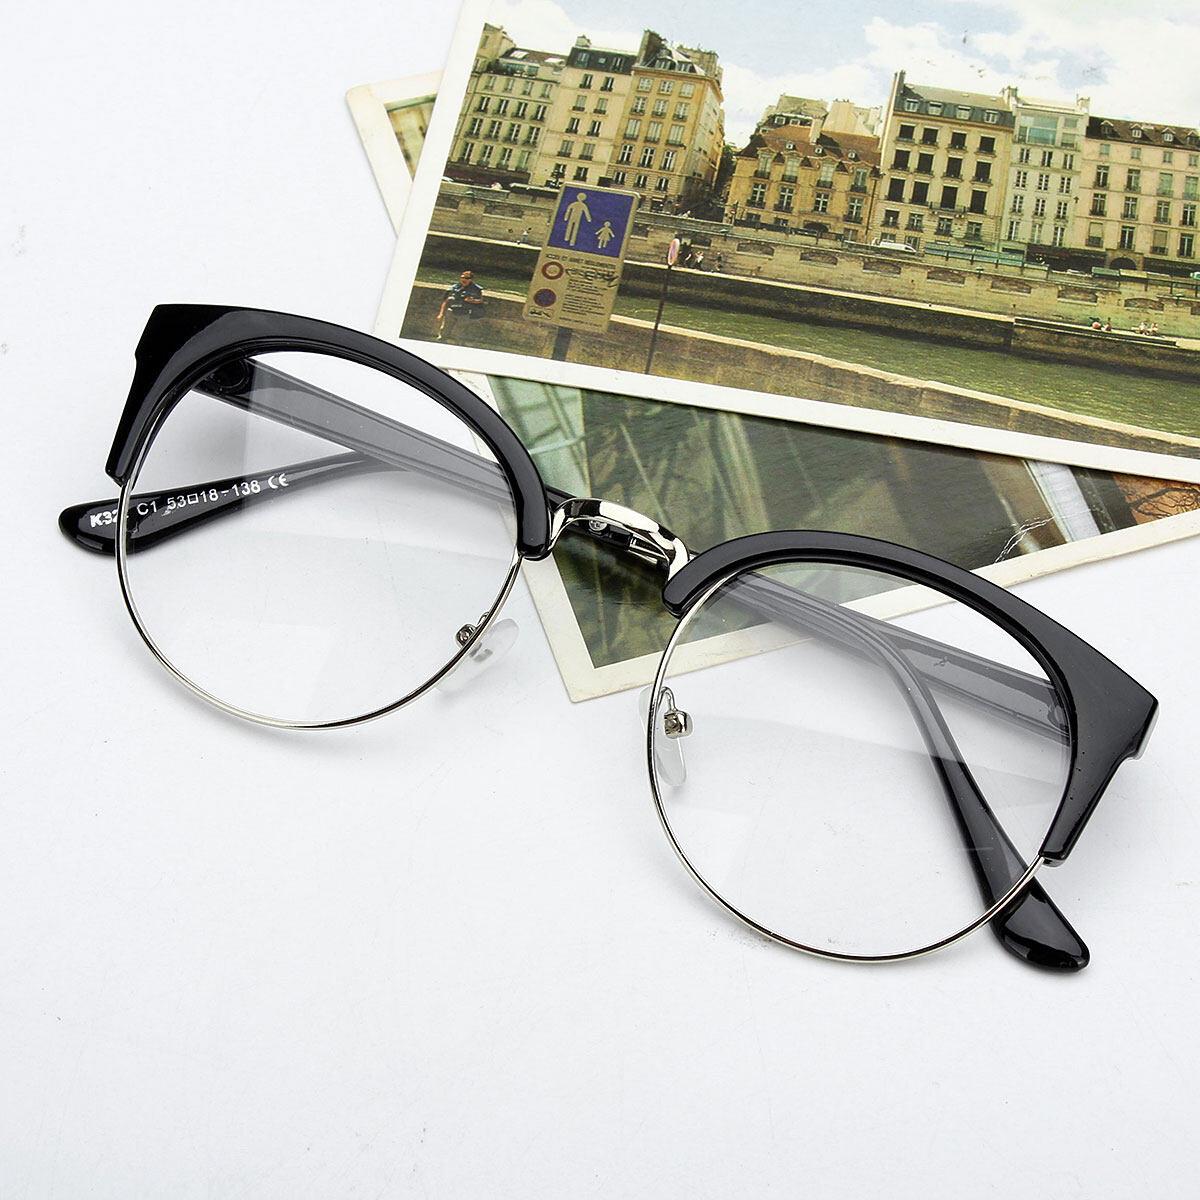 PLS Retro Style Women Men Nerd Glasses Clear Lens Eyewear Round Metal Frame  Glasses 9be48fefaaa1